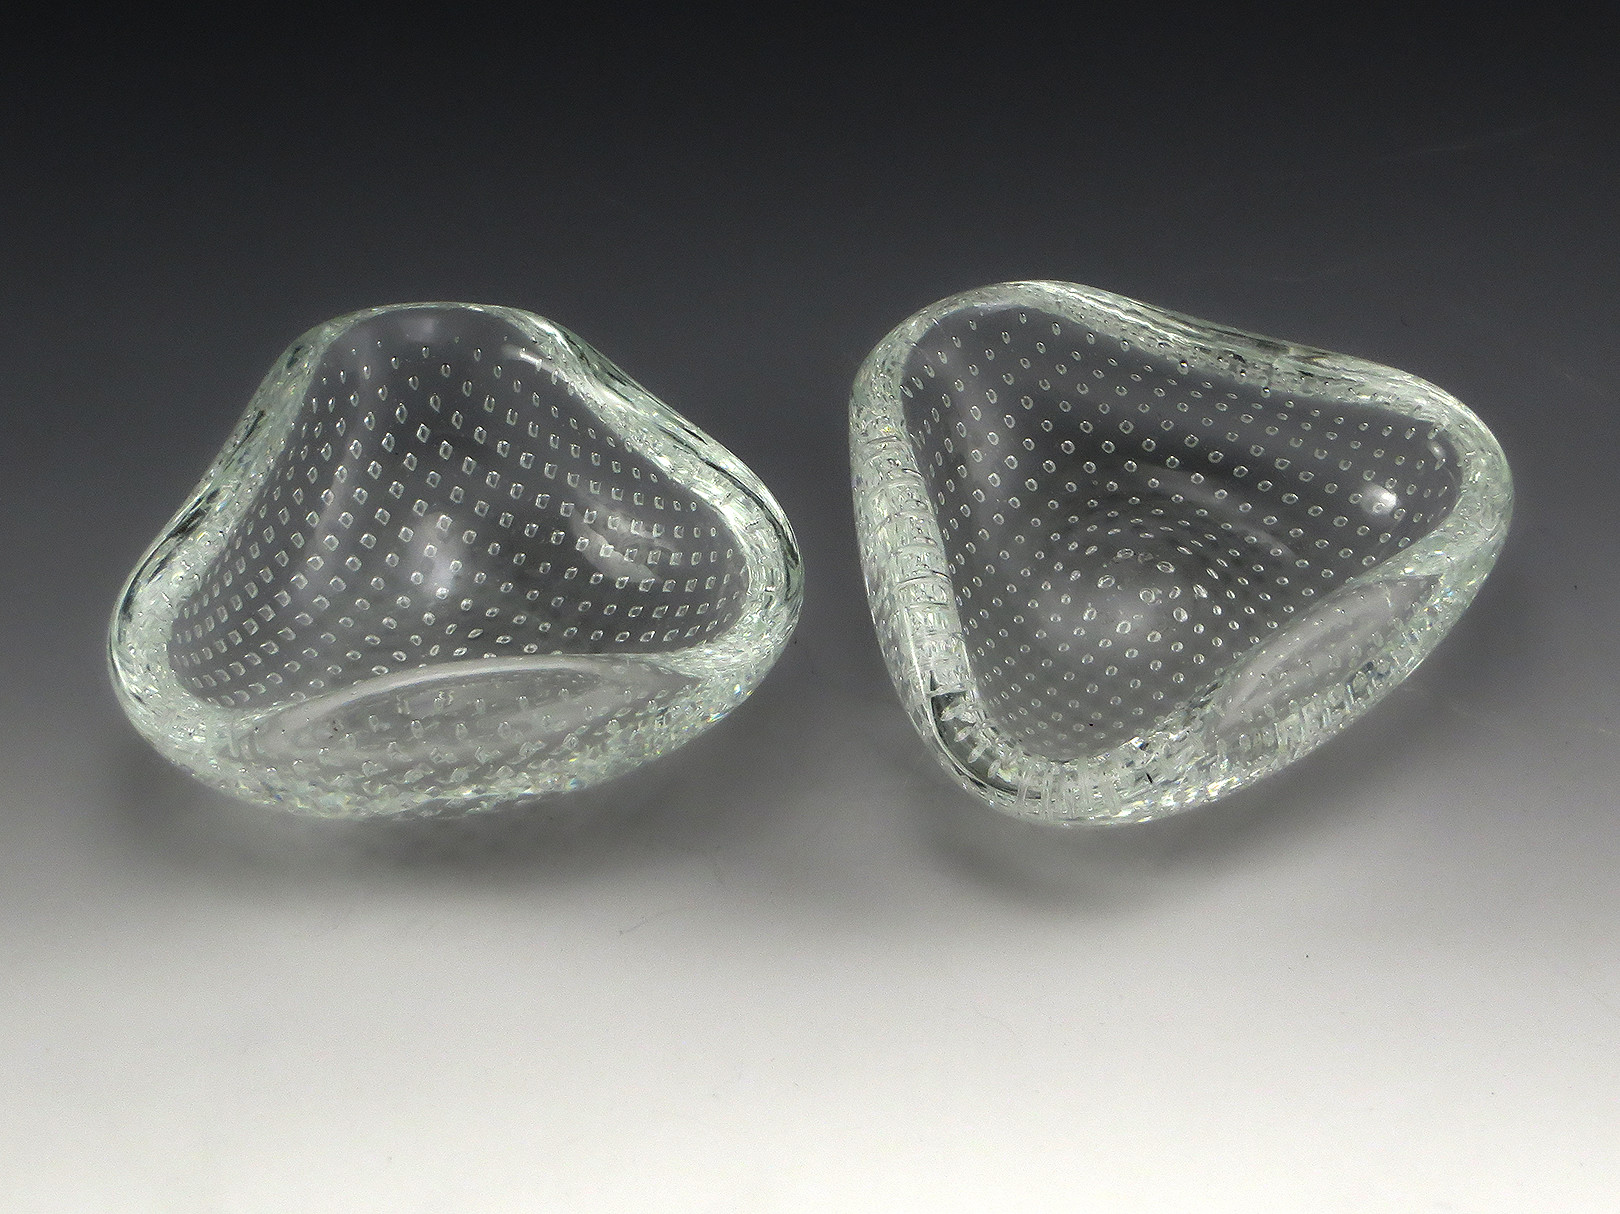 hand blown glass vases bowls of italian venini art glass petite bowls retro art glass regarding set of petite venini art glass bowls with precision embedded pattern of diamond shaped air bubbles